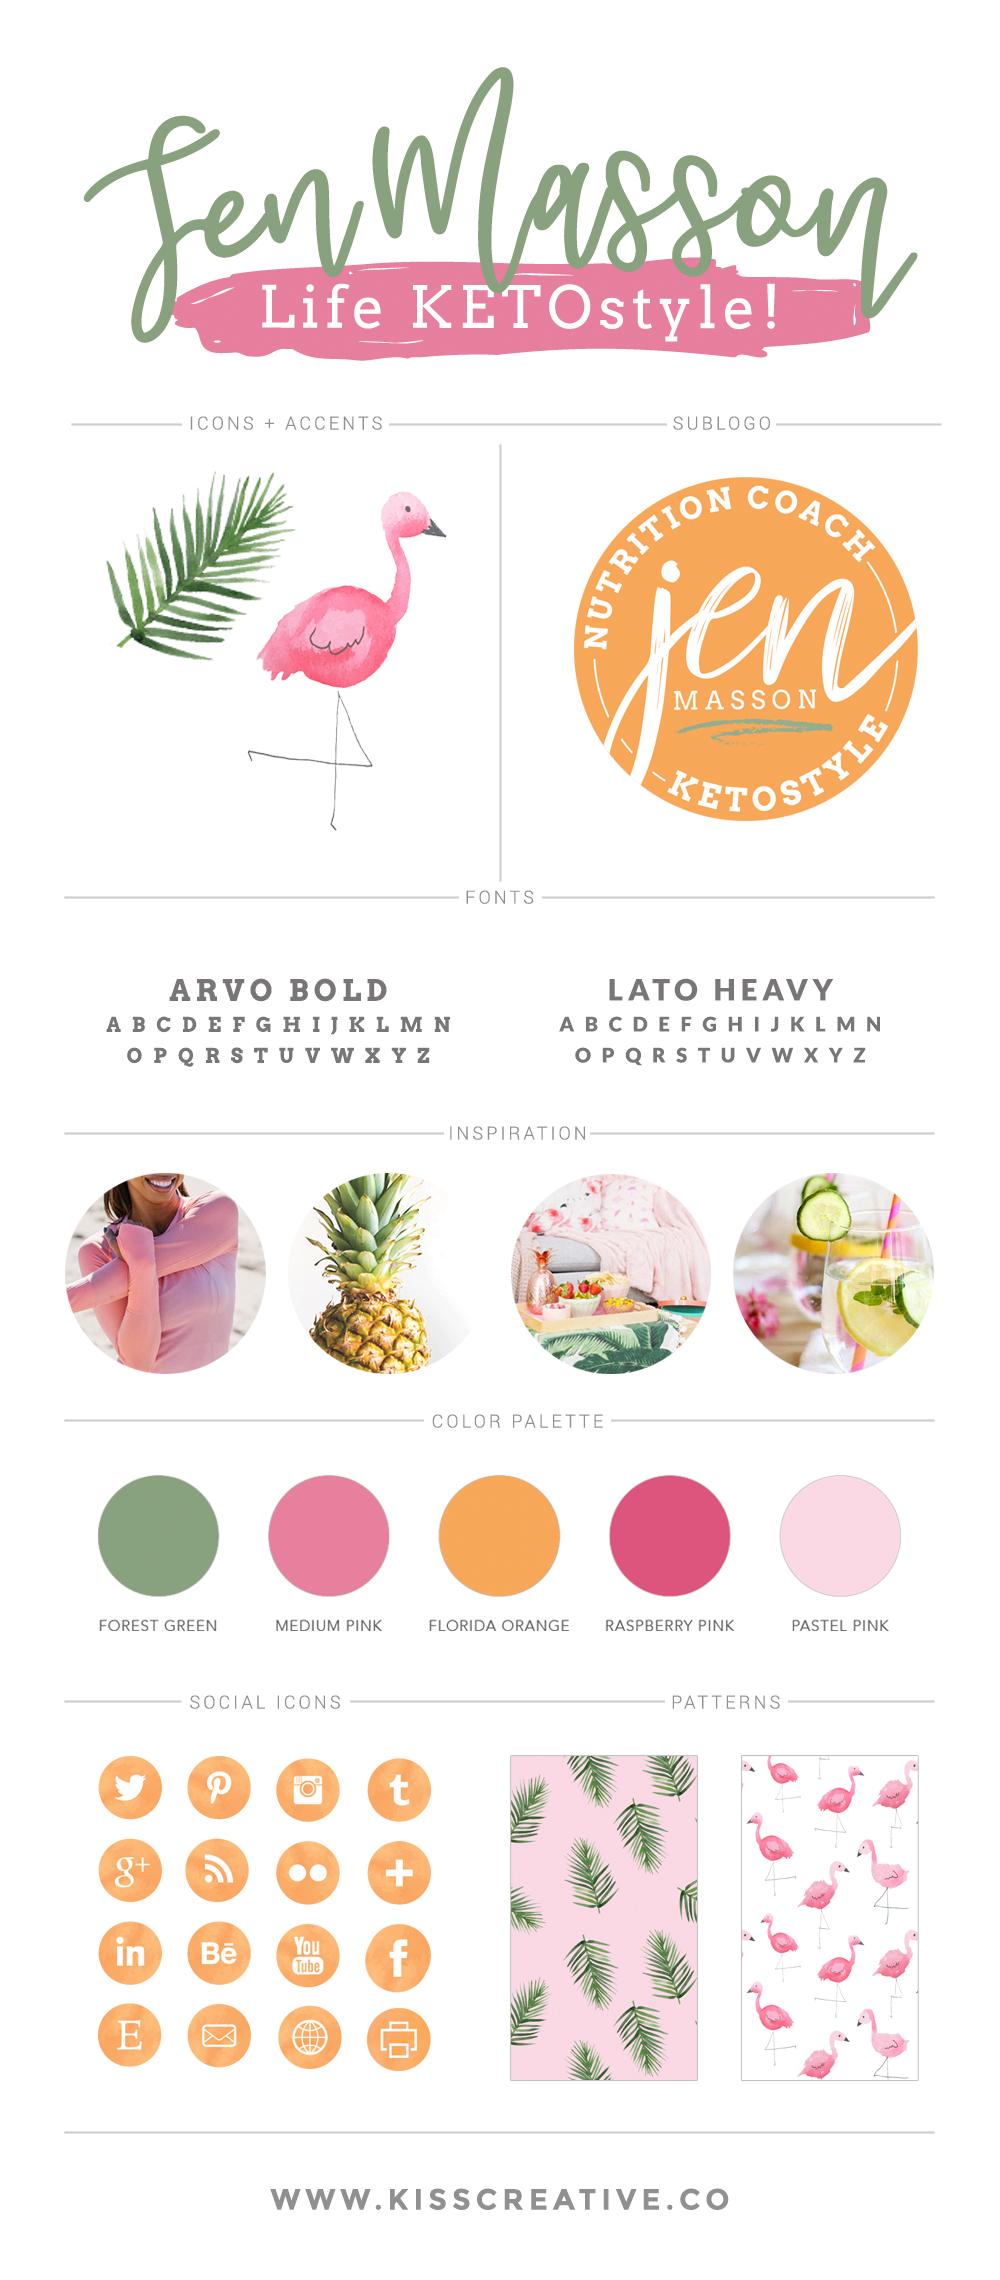 Jen Masson Brand Style Guide | Kiss Creative